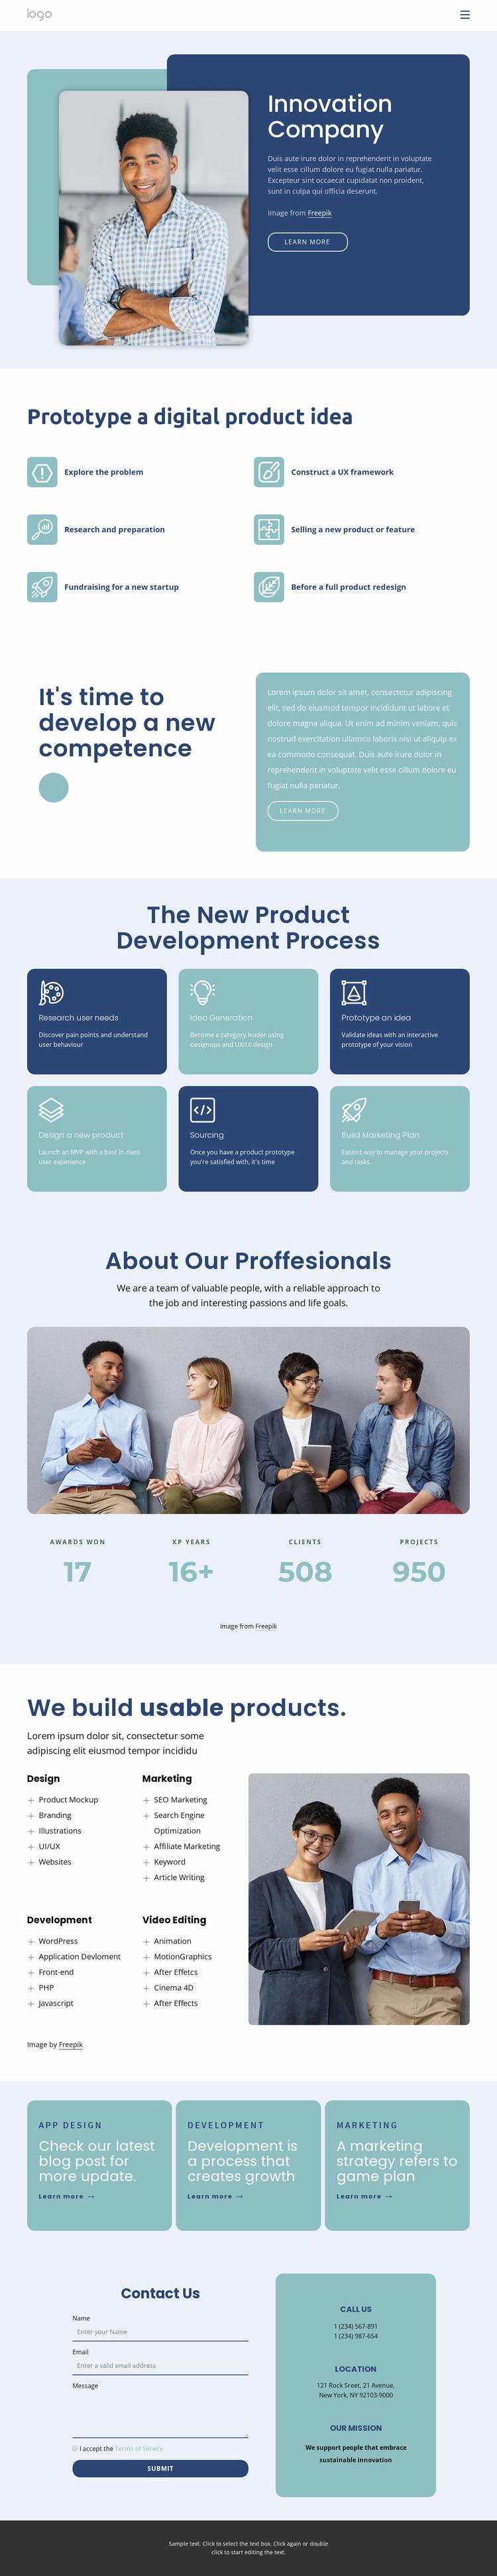 Innovation company Website Design